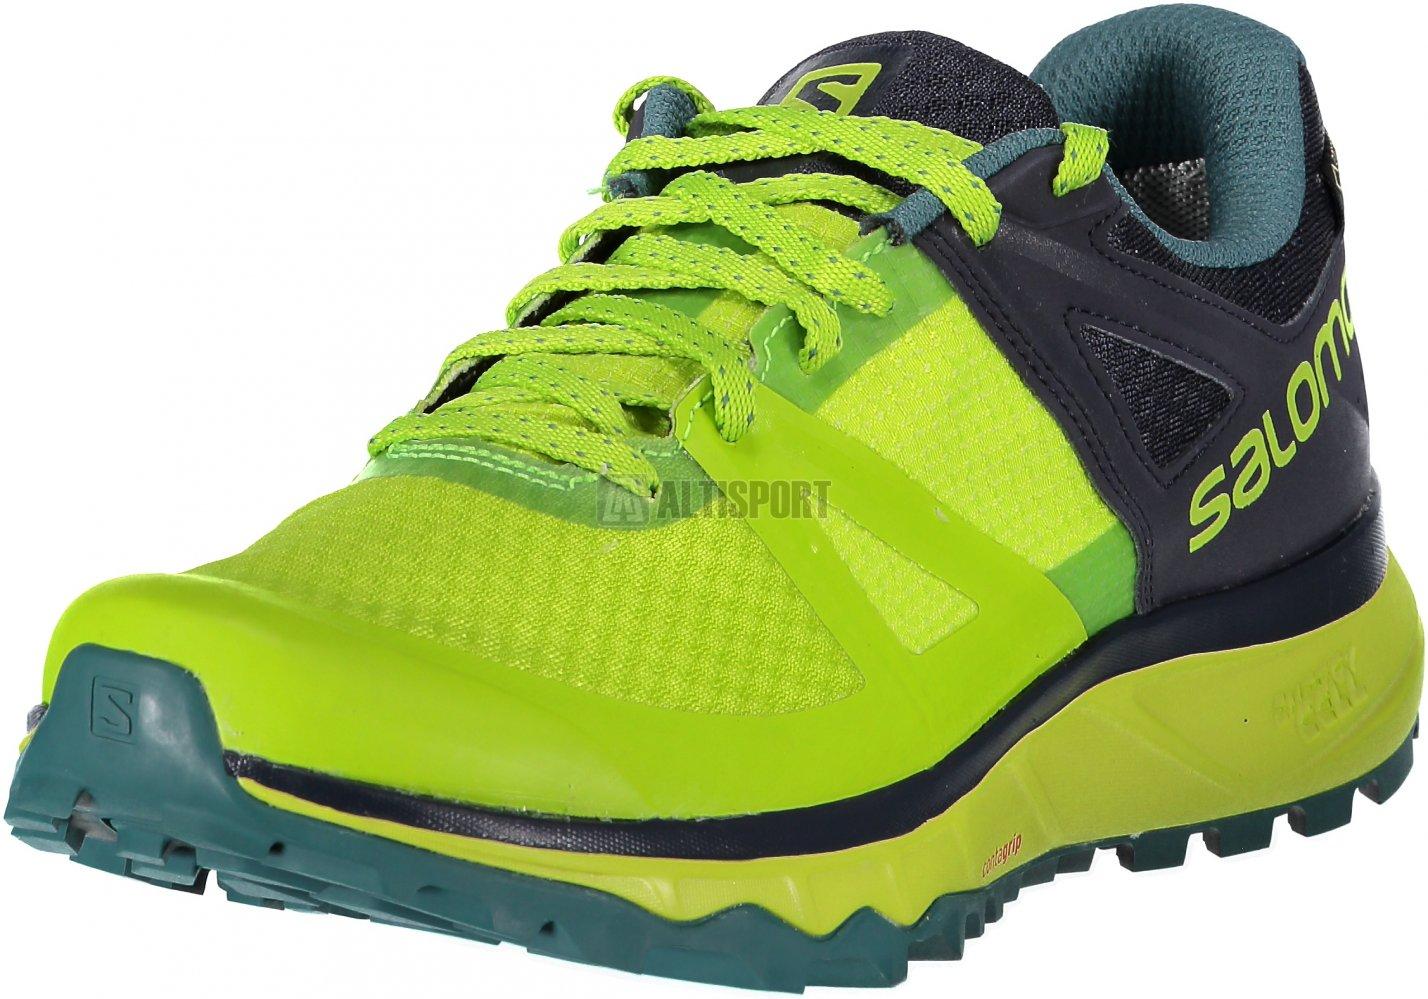 Pánské běžecké boty SALOMON TRAILSTER GTX L40612000 ACID  LIME GRAPHITE HYDRO. f3f12a9c71